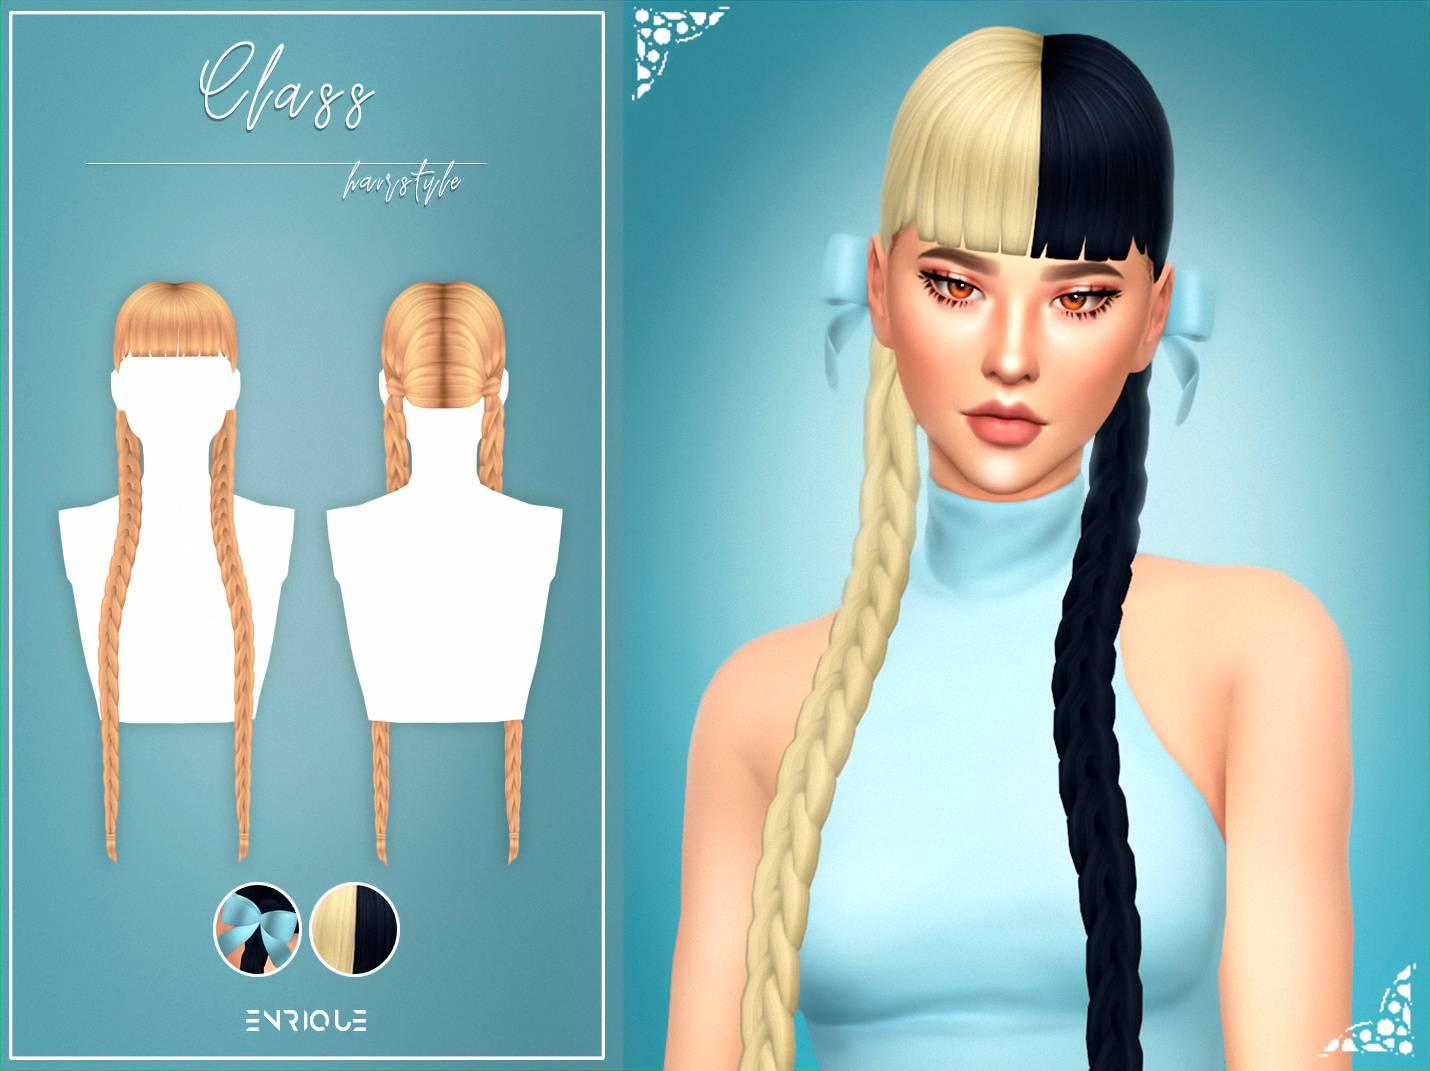 Женская прическа - Class Hairstyle